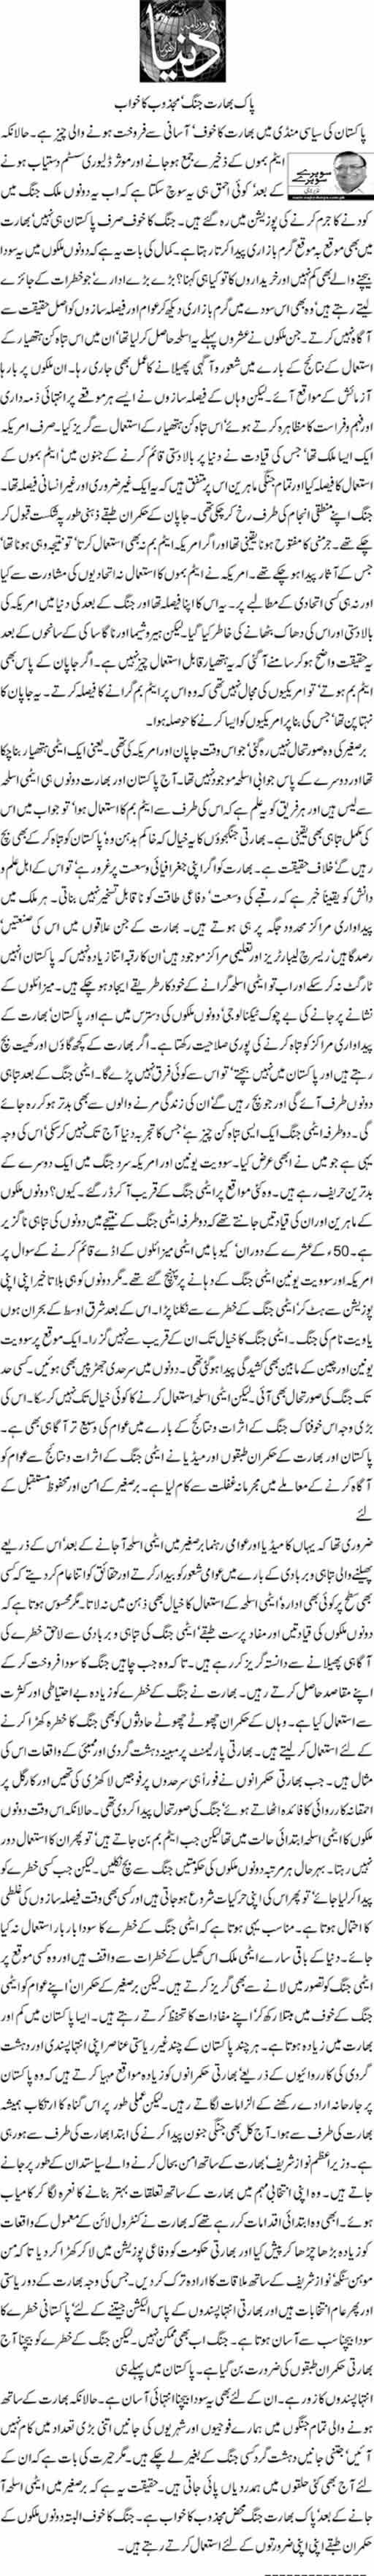 Pak Bharat Jang'Majzoob Ka Khawab - Nazeer Naji